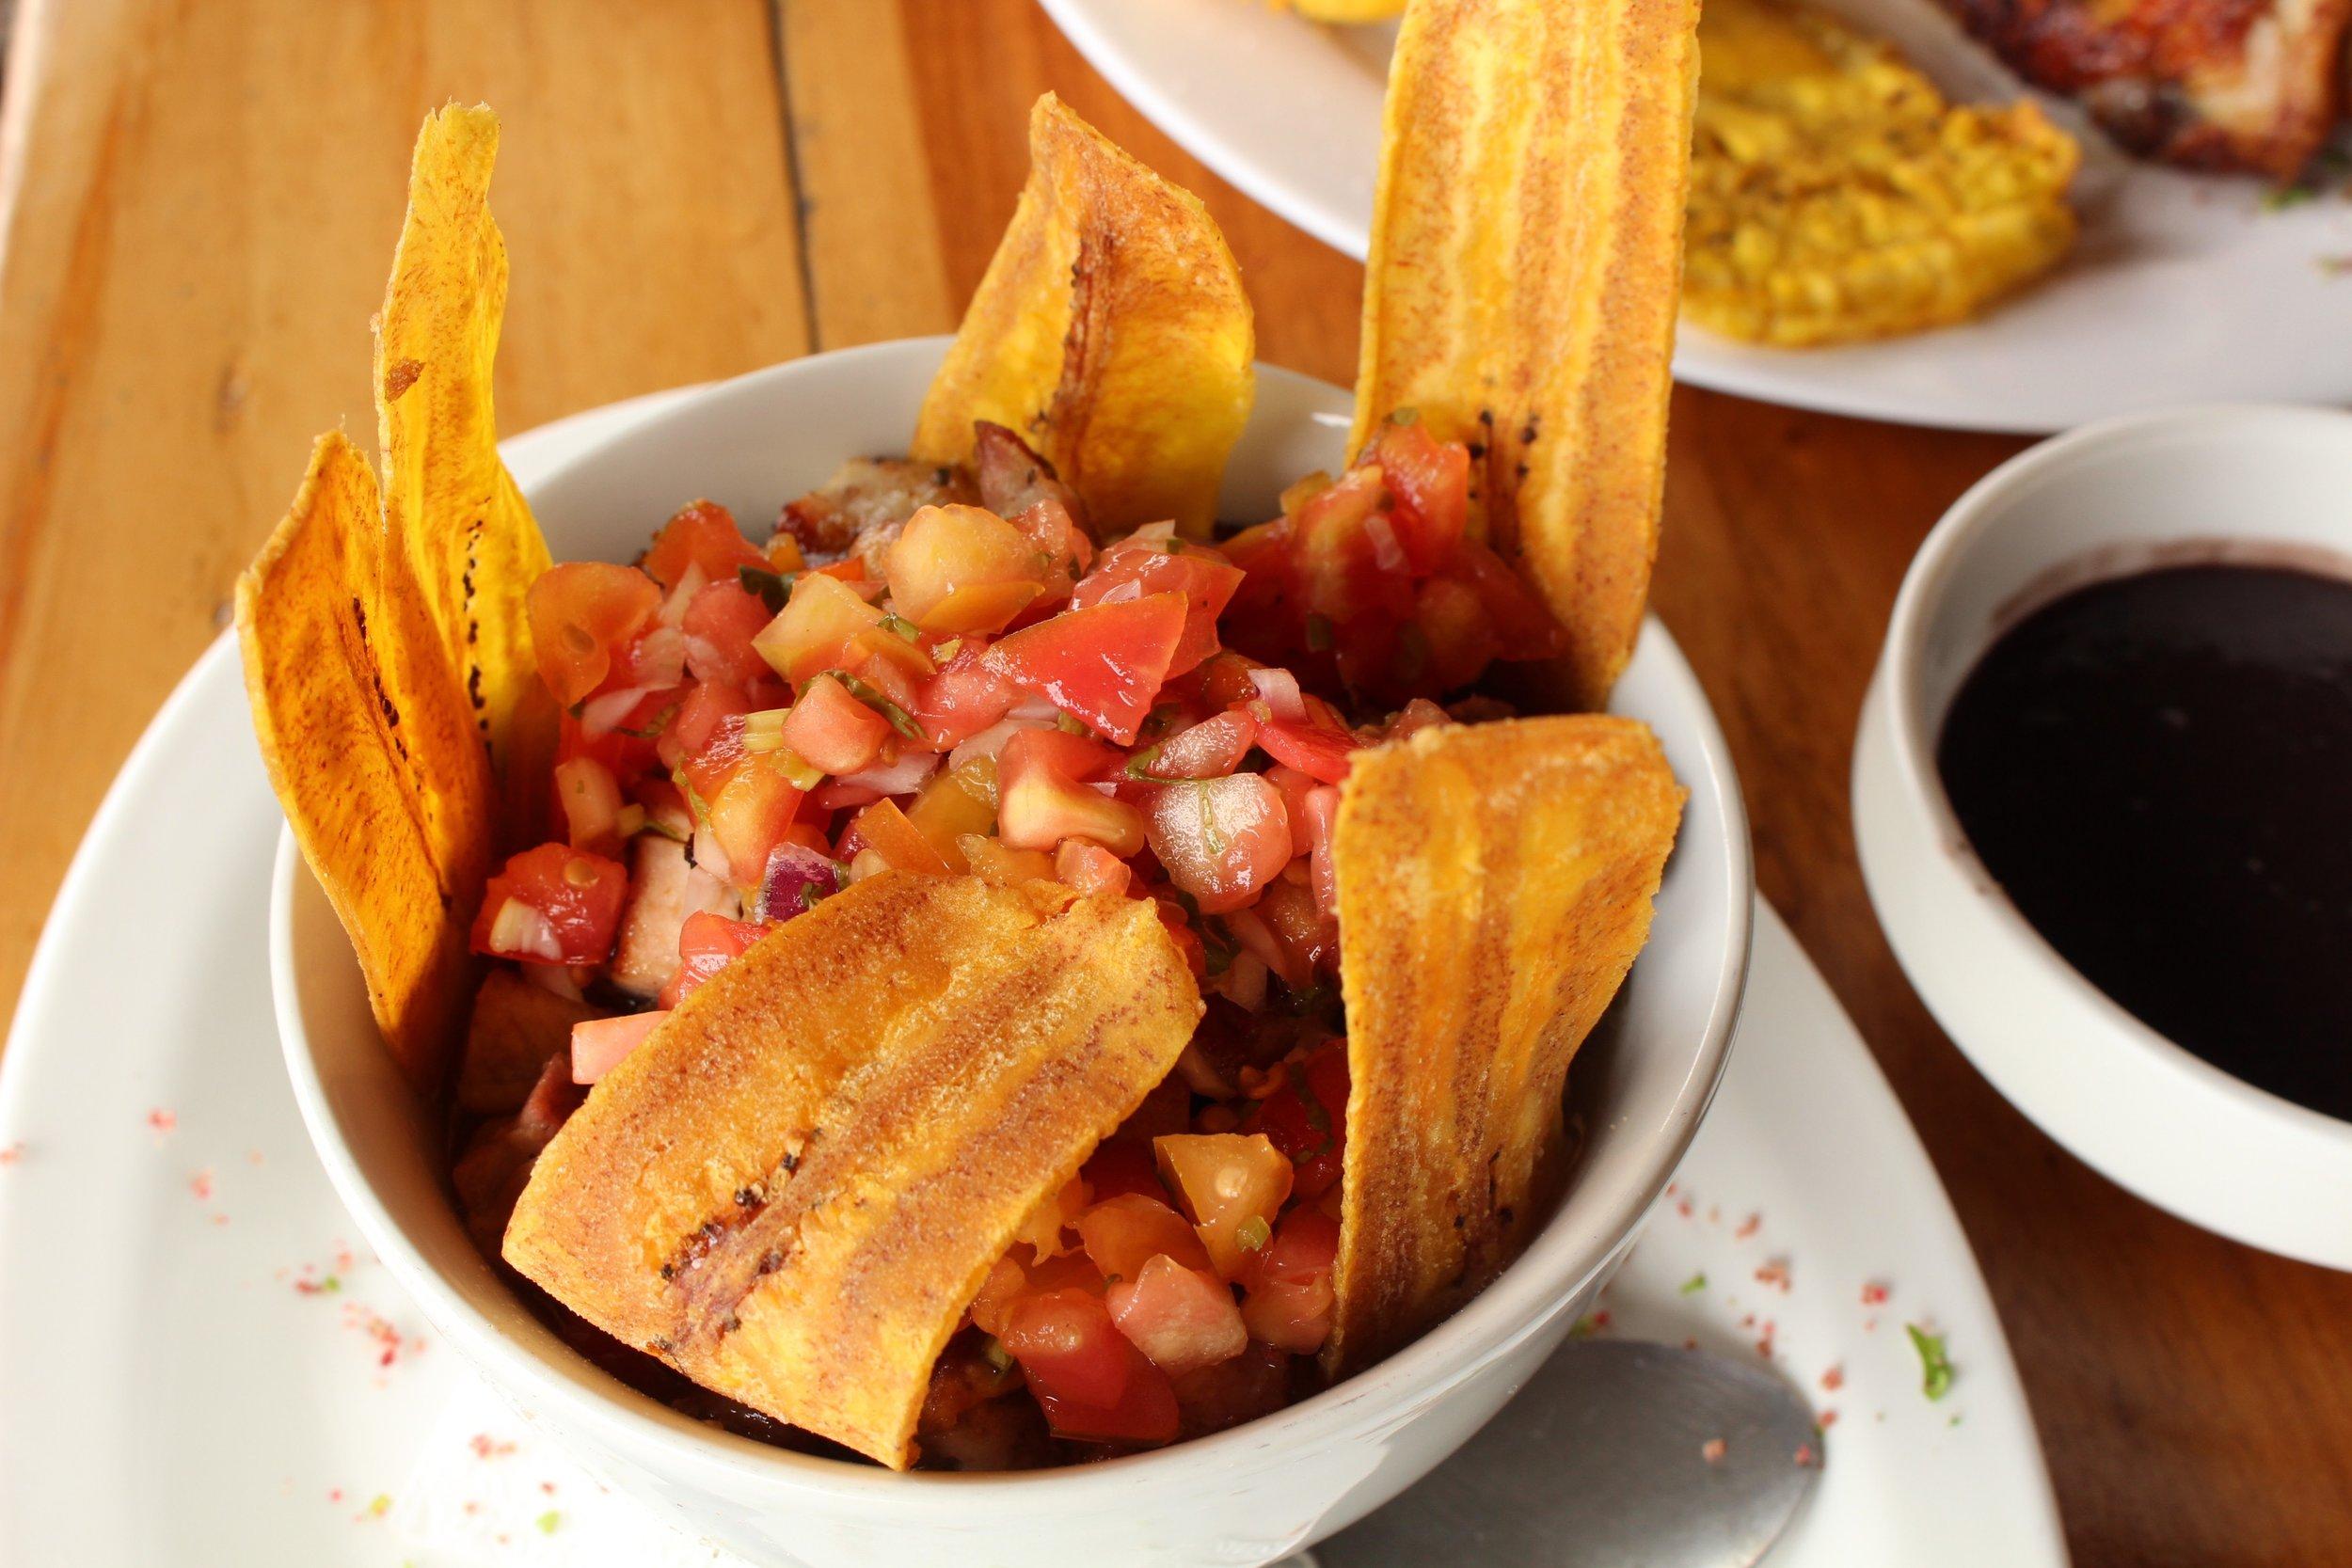 Rice, Beans, Pork, Pico de Gallo and Fried Plantains Chips